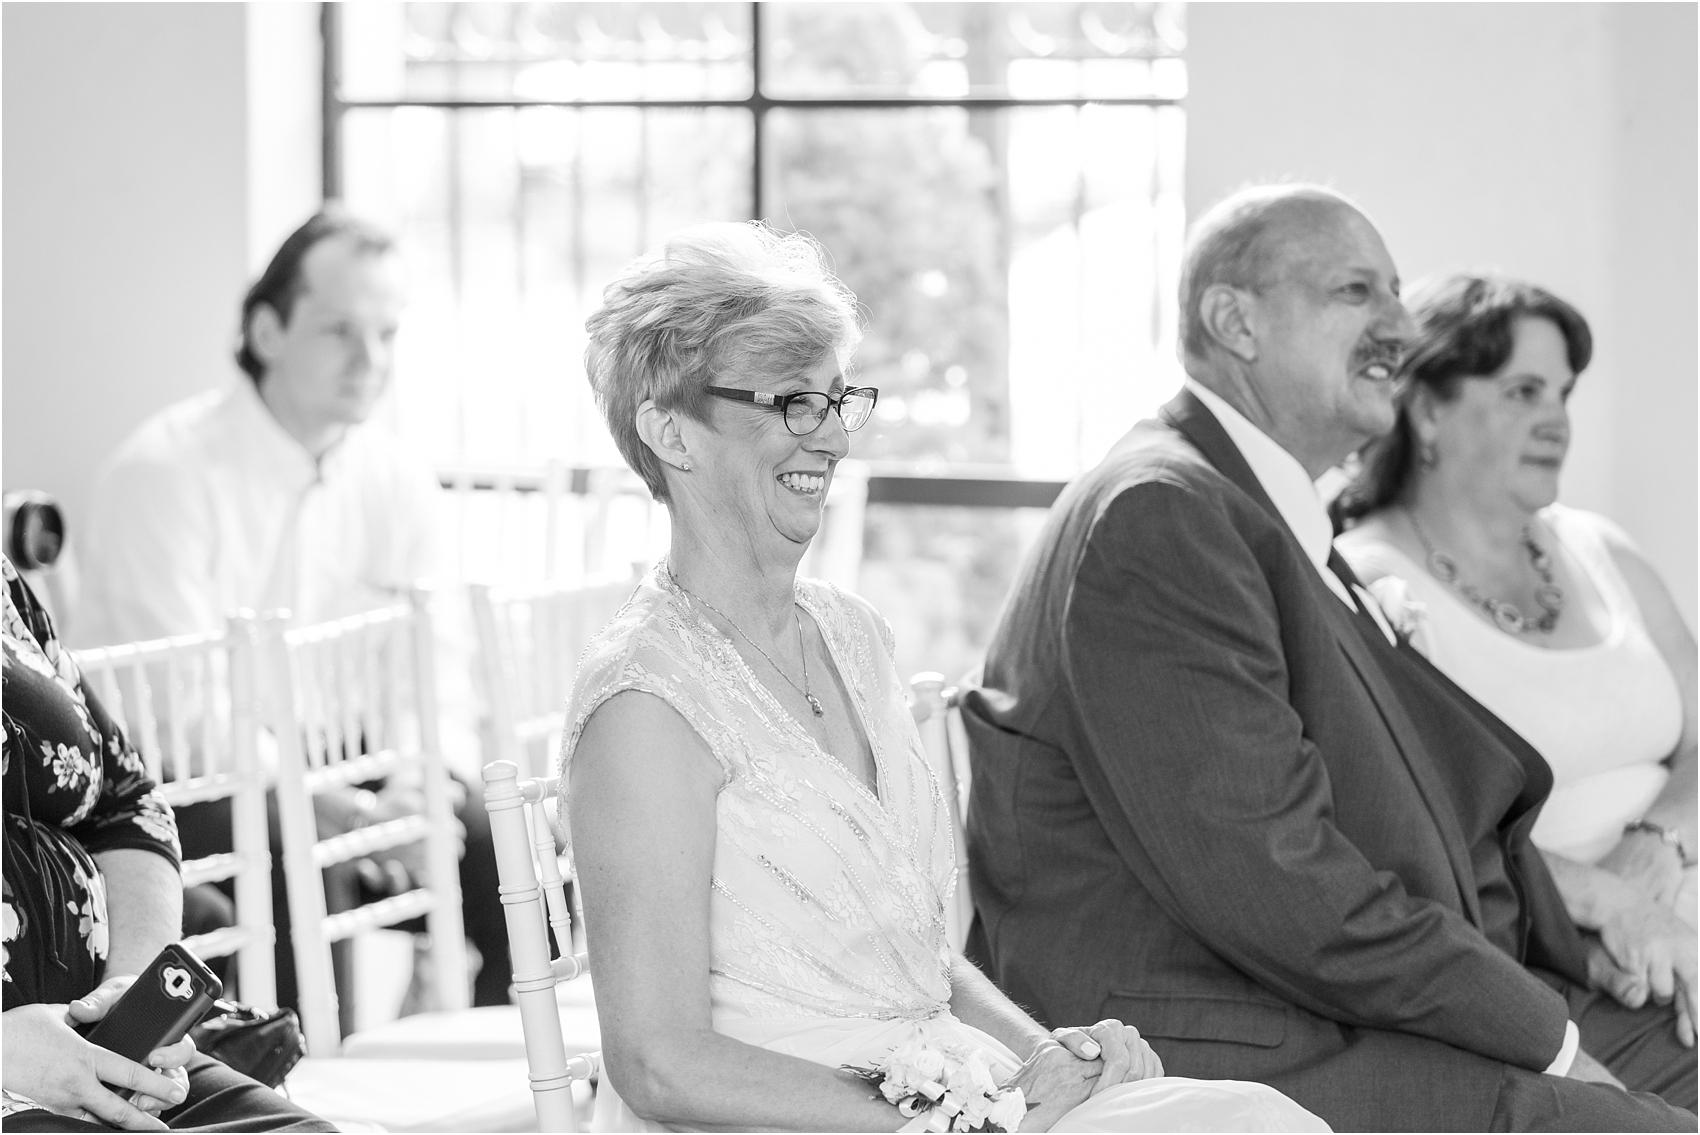 joyful-and-candid-navy-blush-wedding-photos-at-crystal-gardens-in-howell-mi-by-courtney-carolyn-photography_0039.jpg